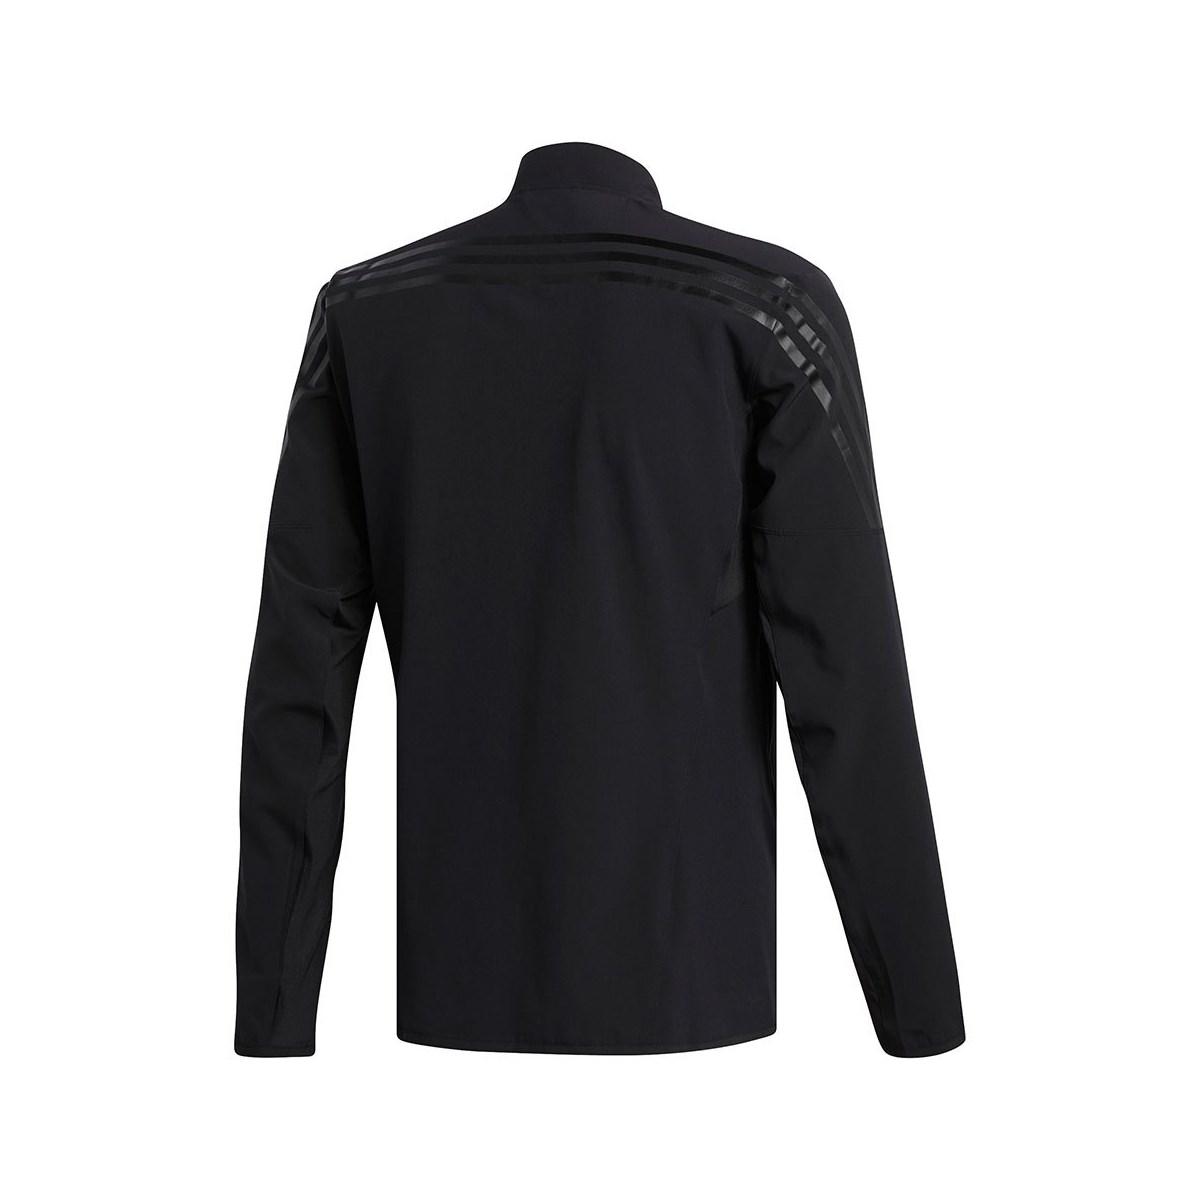 Aeroready 3-Stripes Erkek Siyah Spor Ceket